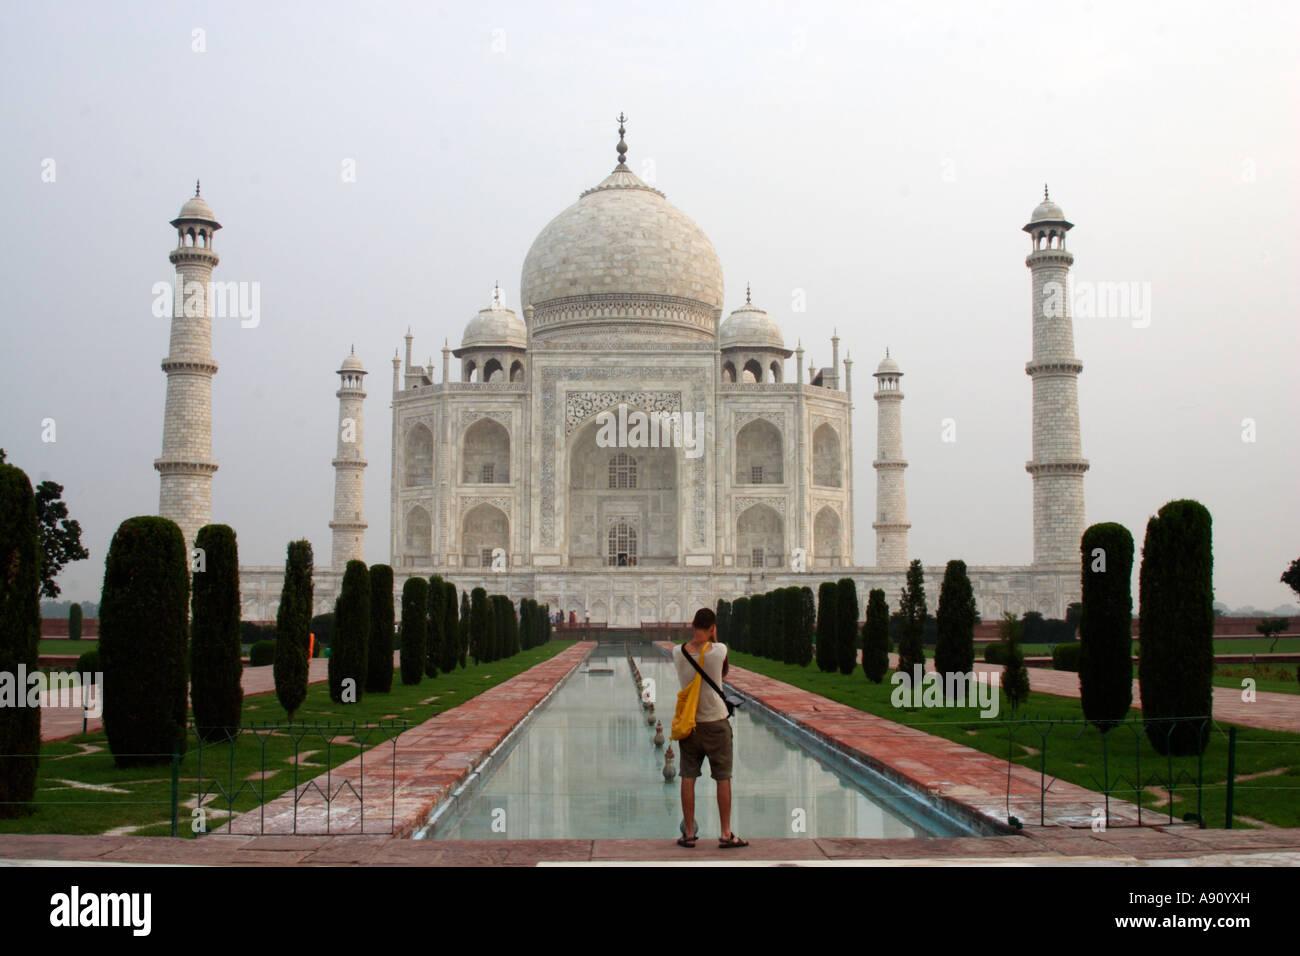 La prise de photo de l'hôtel Taj Mahal, Agra, Inde Banque D'Images